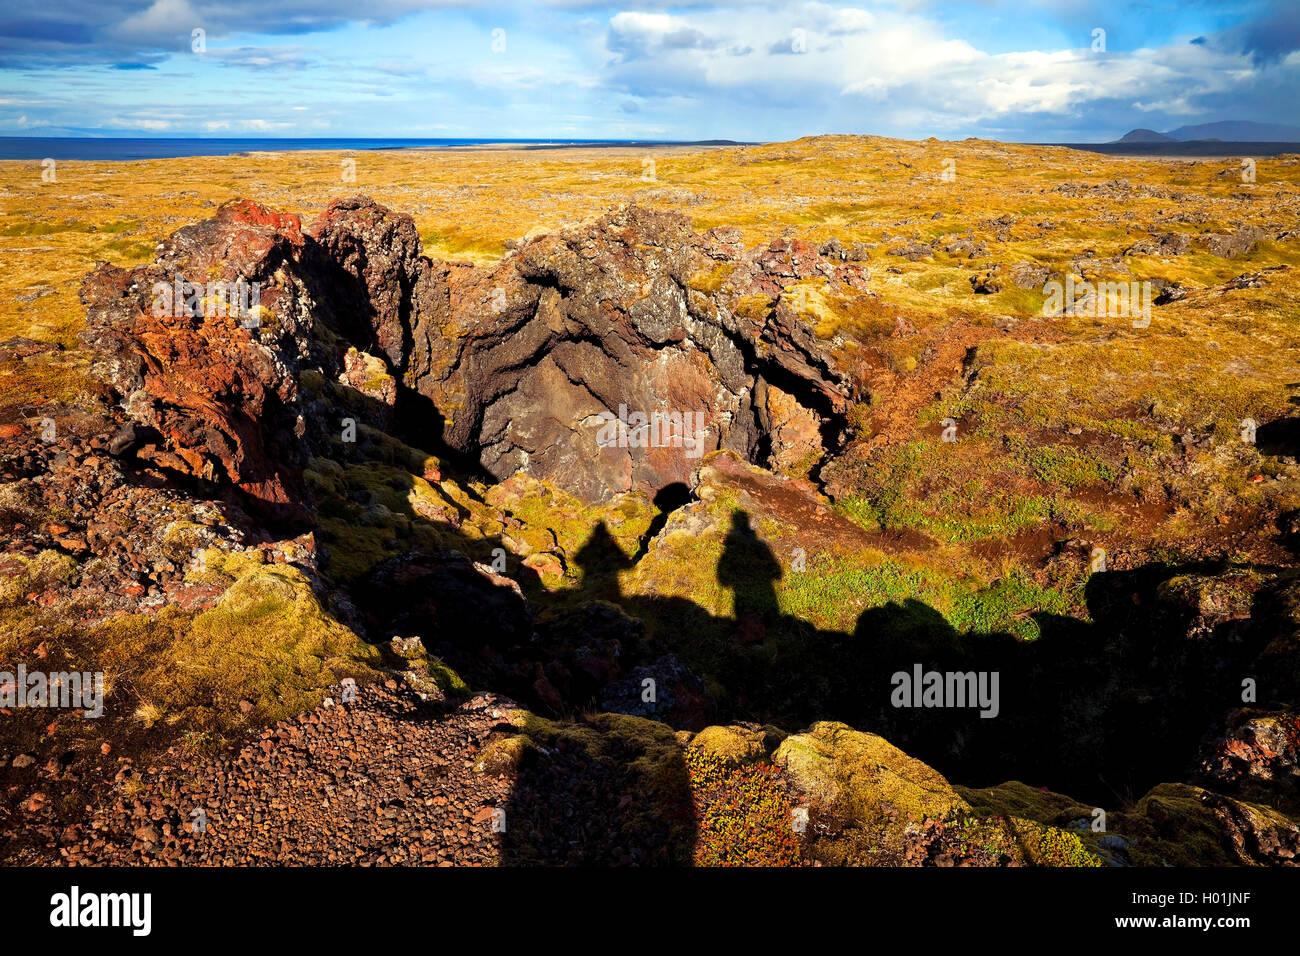 Krater im Lavafeld Neshraun, Island, Snaefellsnes, snae | Neshraun lava field with crater, Iceland, Snaefellsnes, - Stock Image